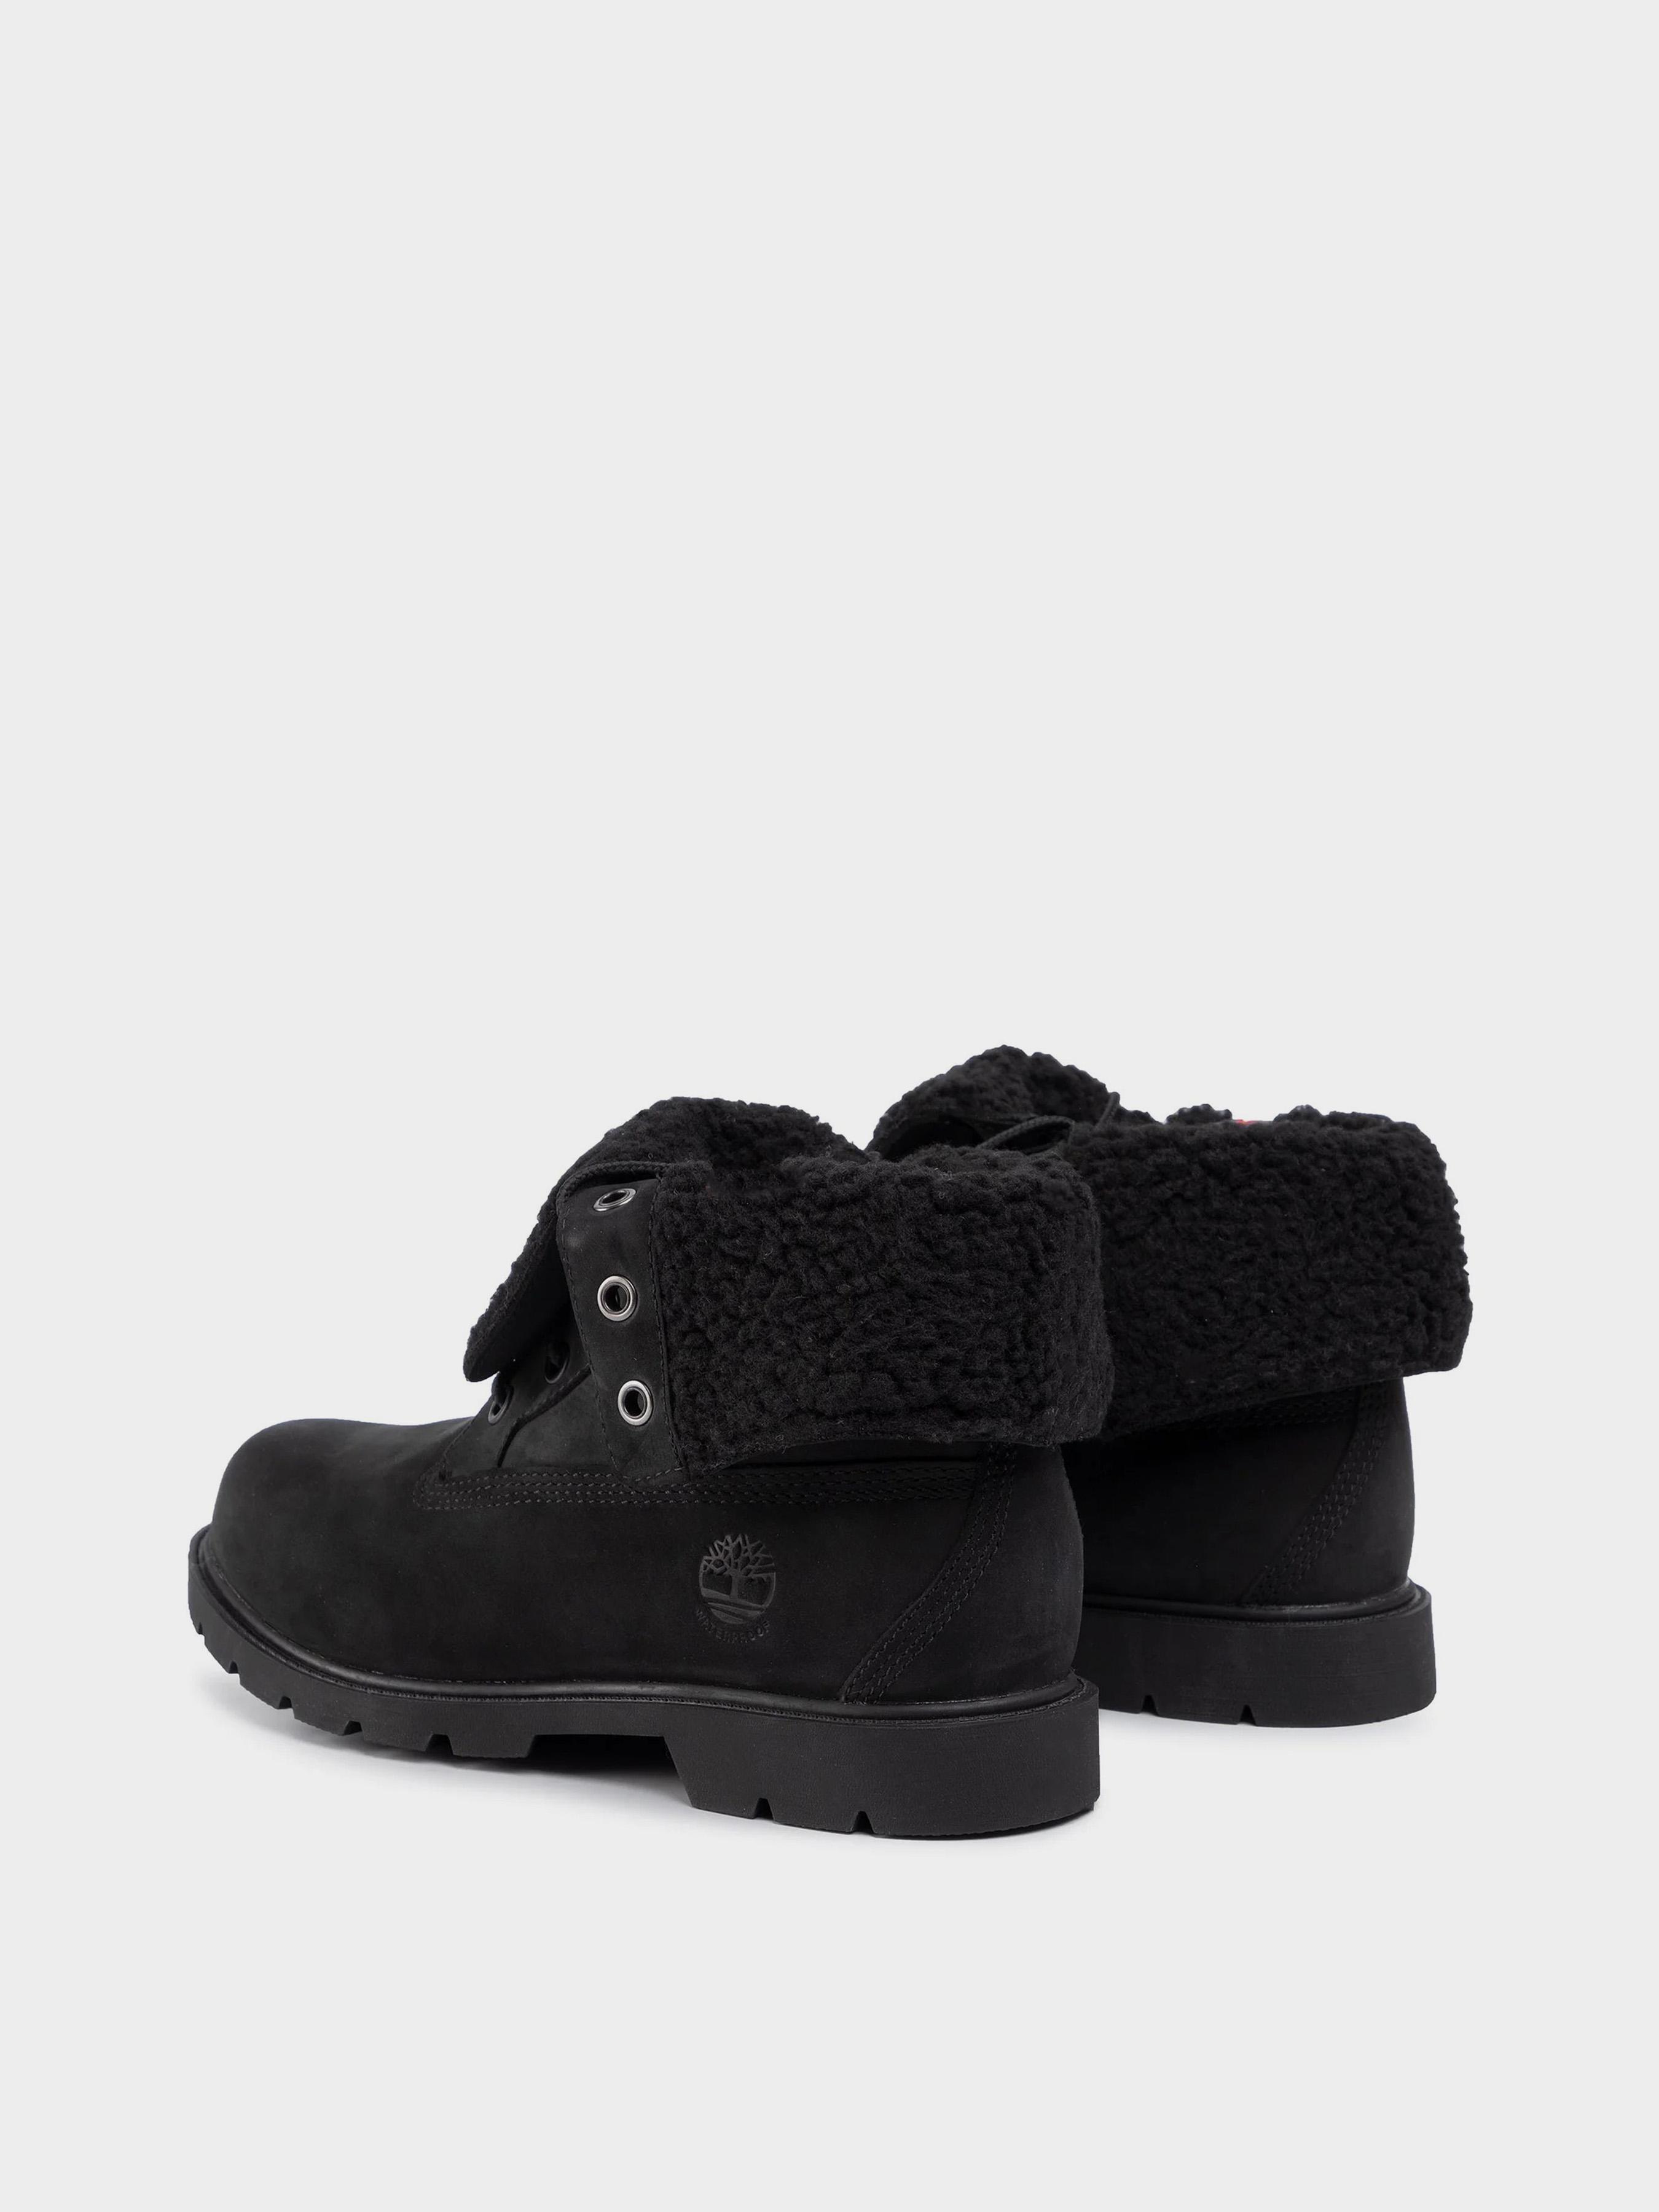 Ботинки для женщин Timberland Iconic Classics TG2348 брендовая обувь, 2017